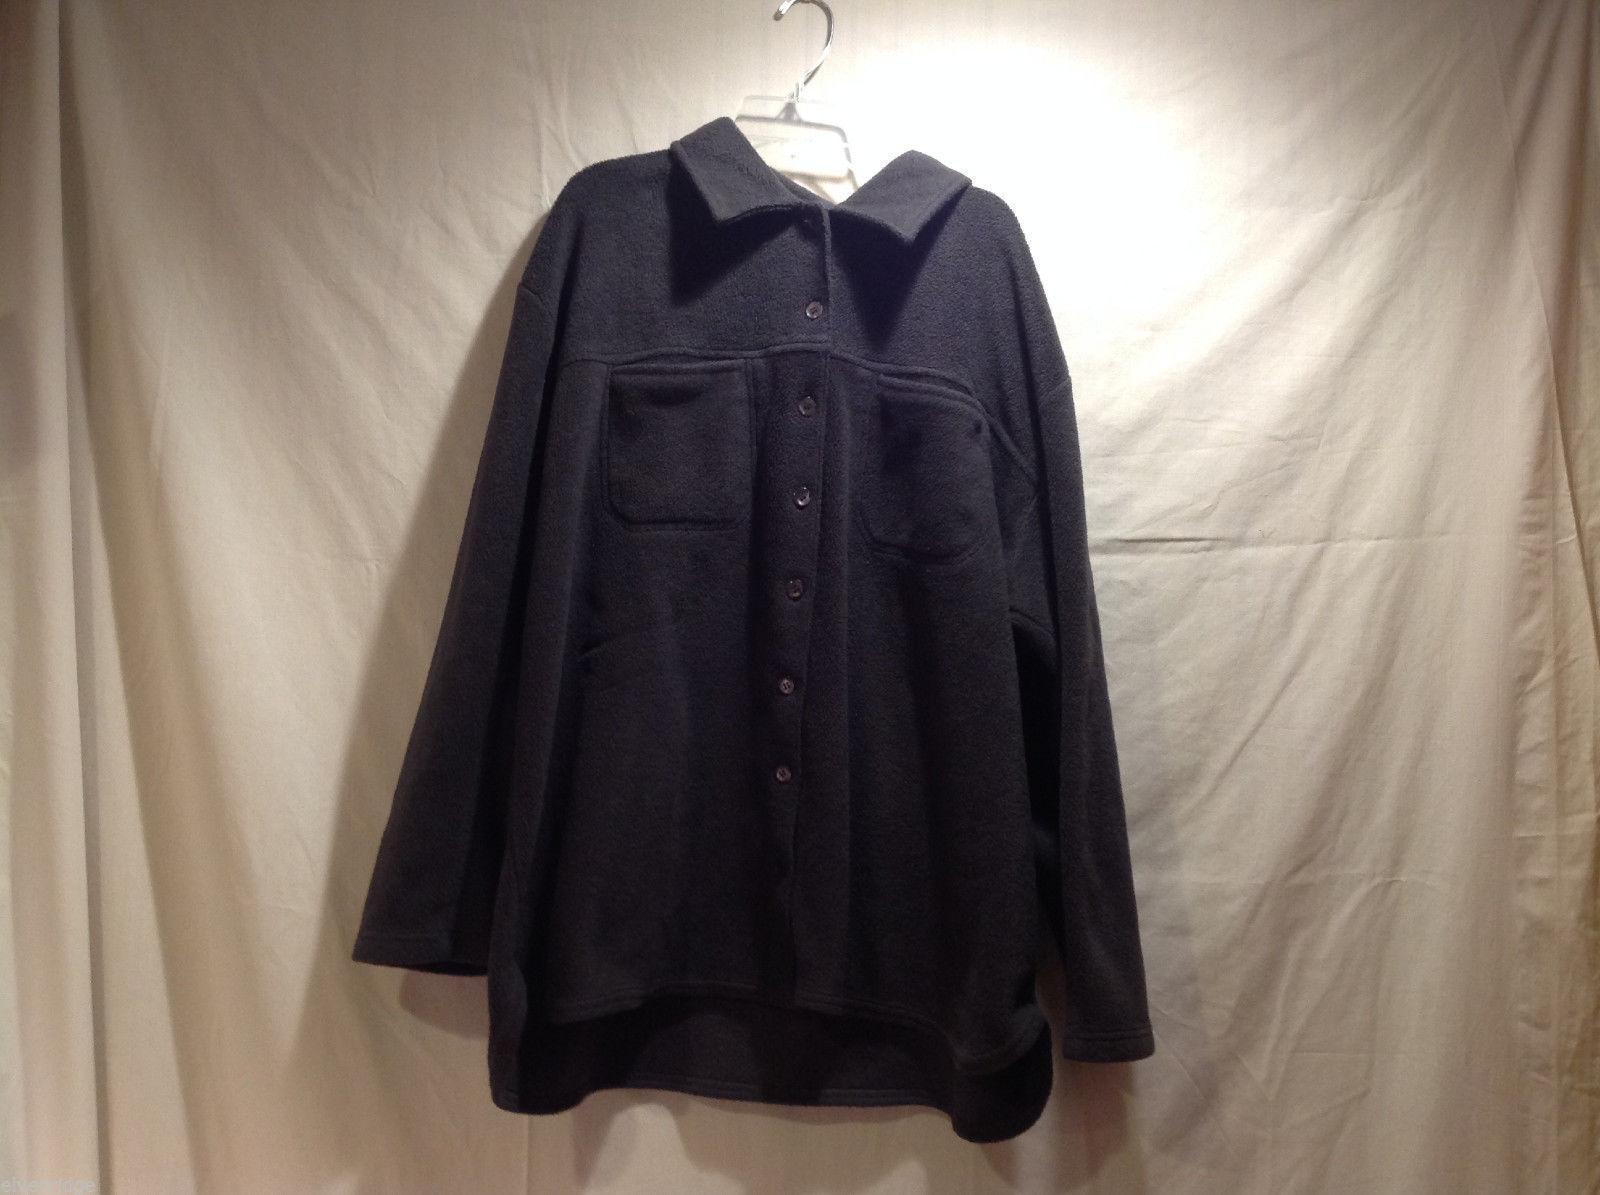 Golden Touch Woman Dark Gray 100% Polyester Button Up Fleece Jacket Top, Size 2X